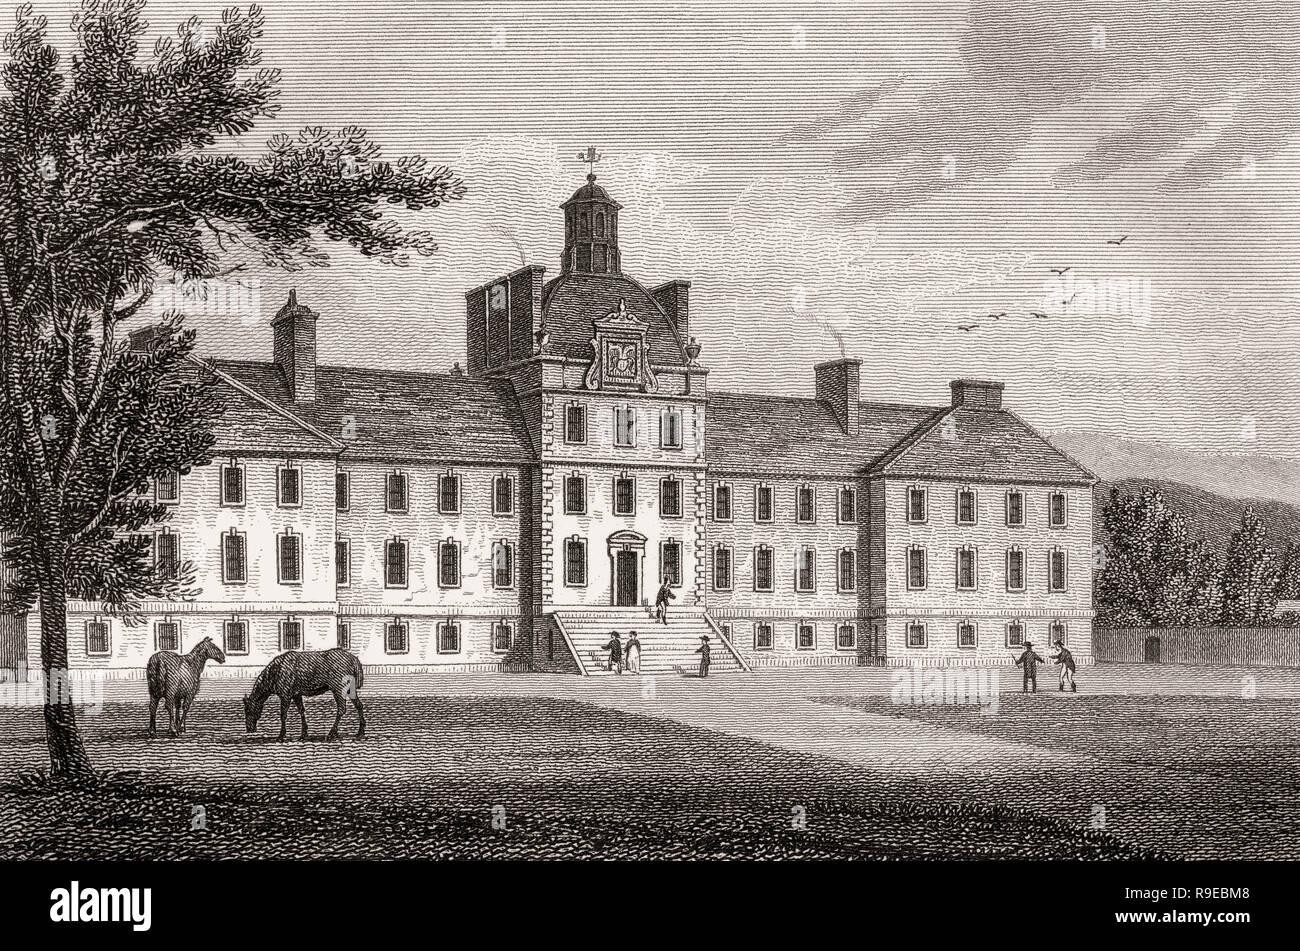 Original George Watson's Hospital, Edinburgh, Scotland, 19th century, Views in Edinburgh by J. & H. S. Storer - Stock Image